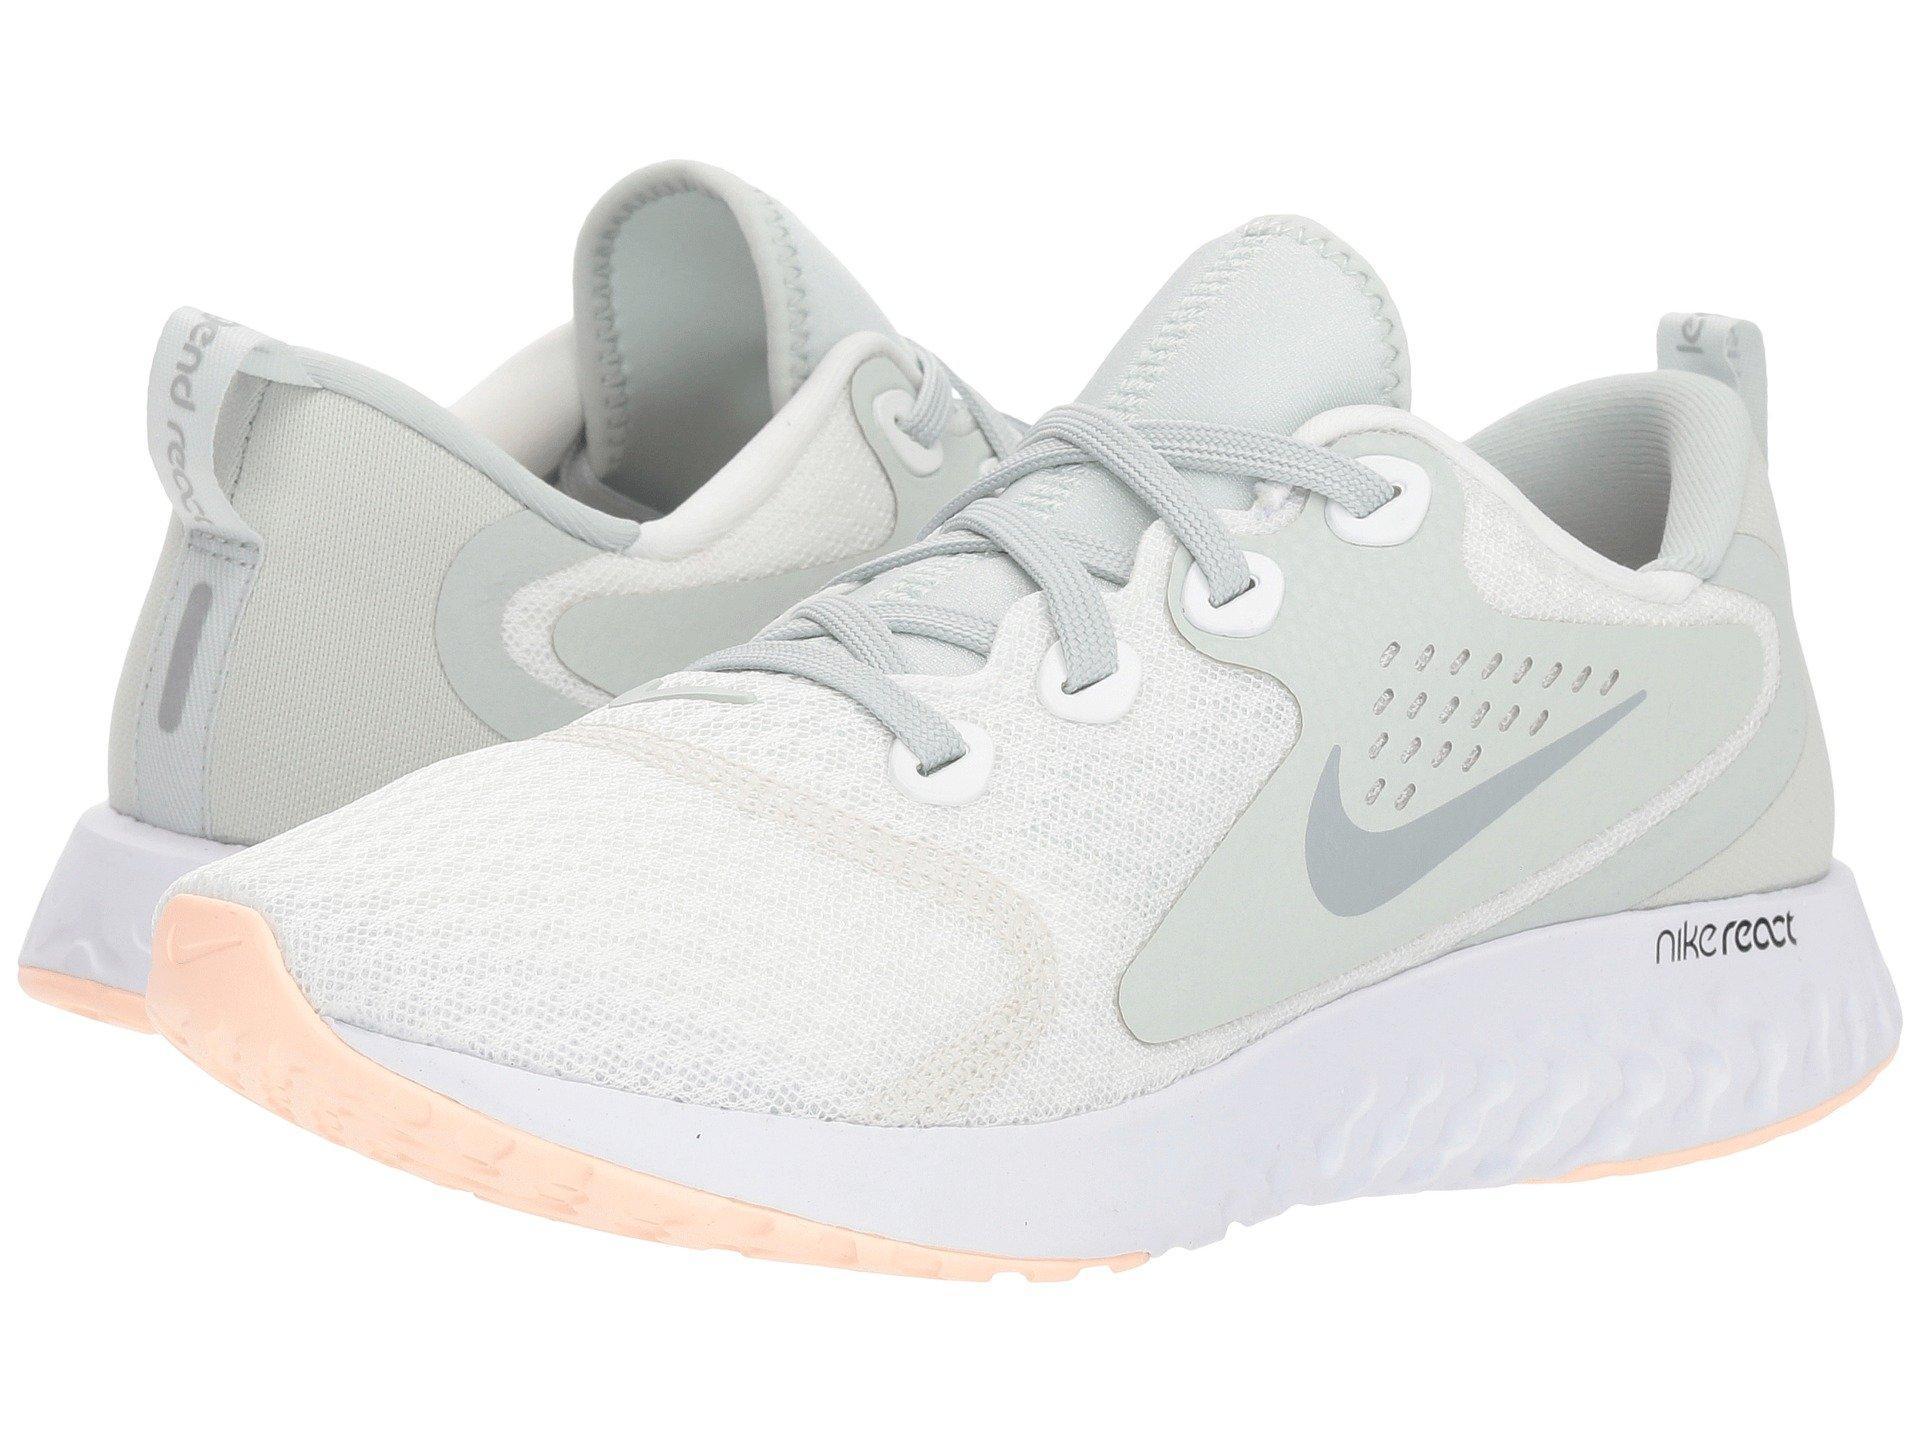 08ac78a0ae479 Nike Legend React (black/white/white) Women's Running Shoes in White ...